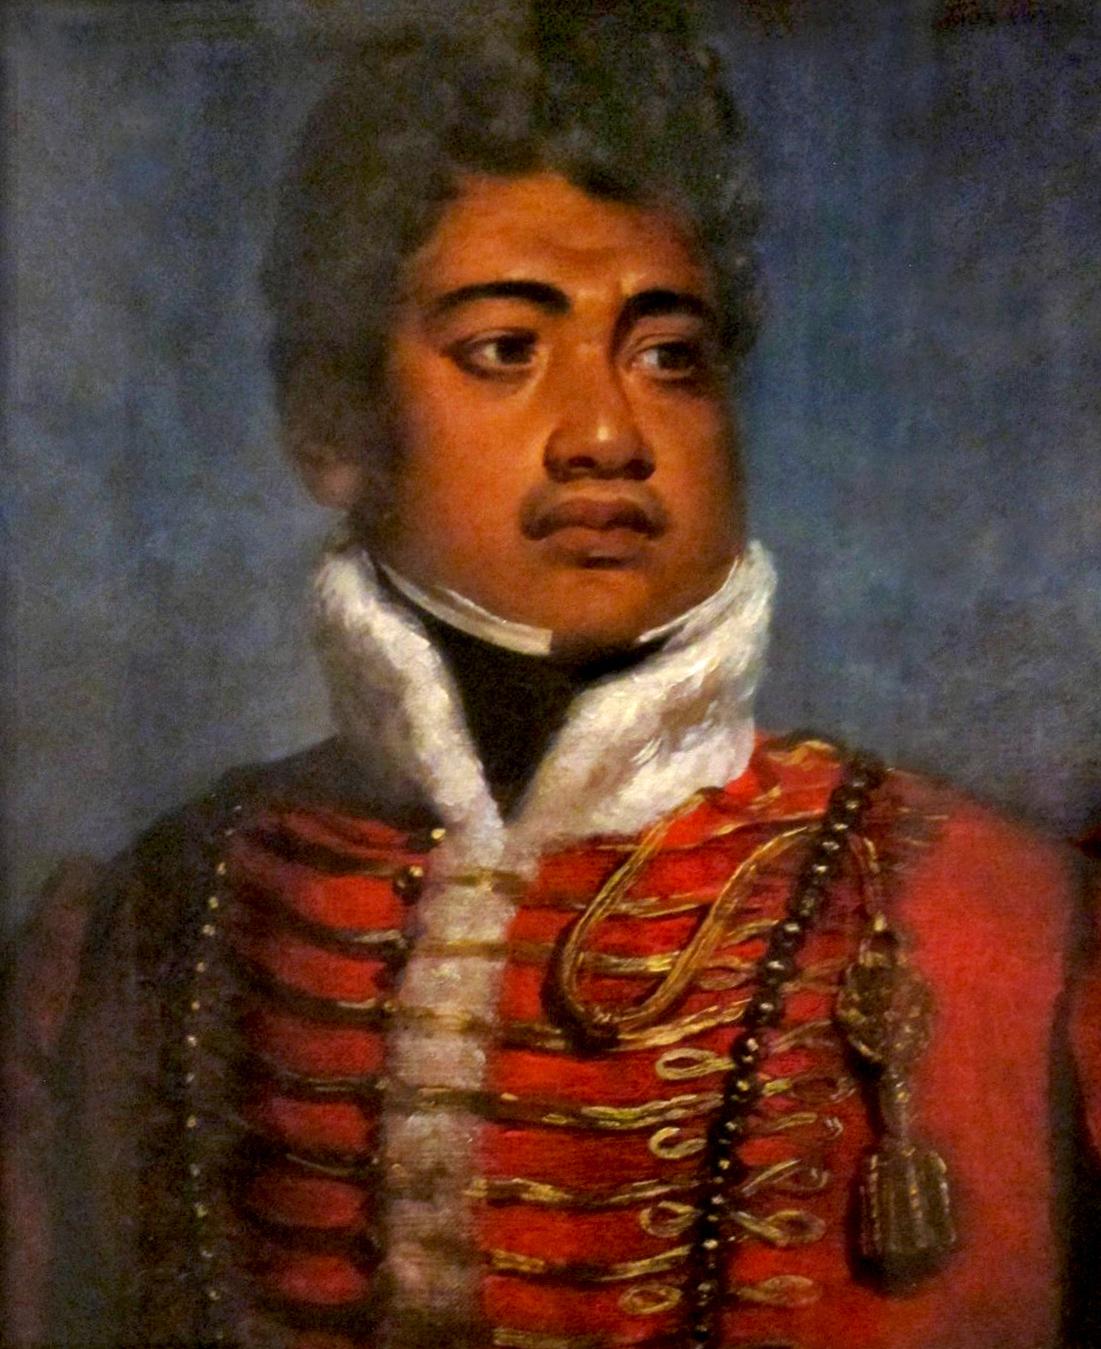 Portrait of King Kamehameha II of Hawaii attributed to John Hayter, 1824, Iolani Palace. Image courtesy of Wikimedia Commons.